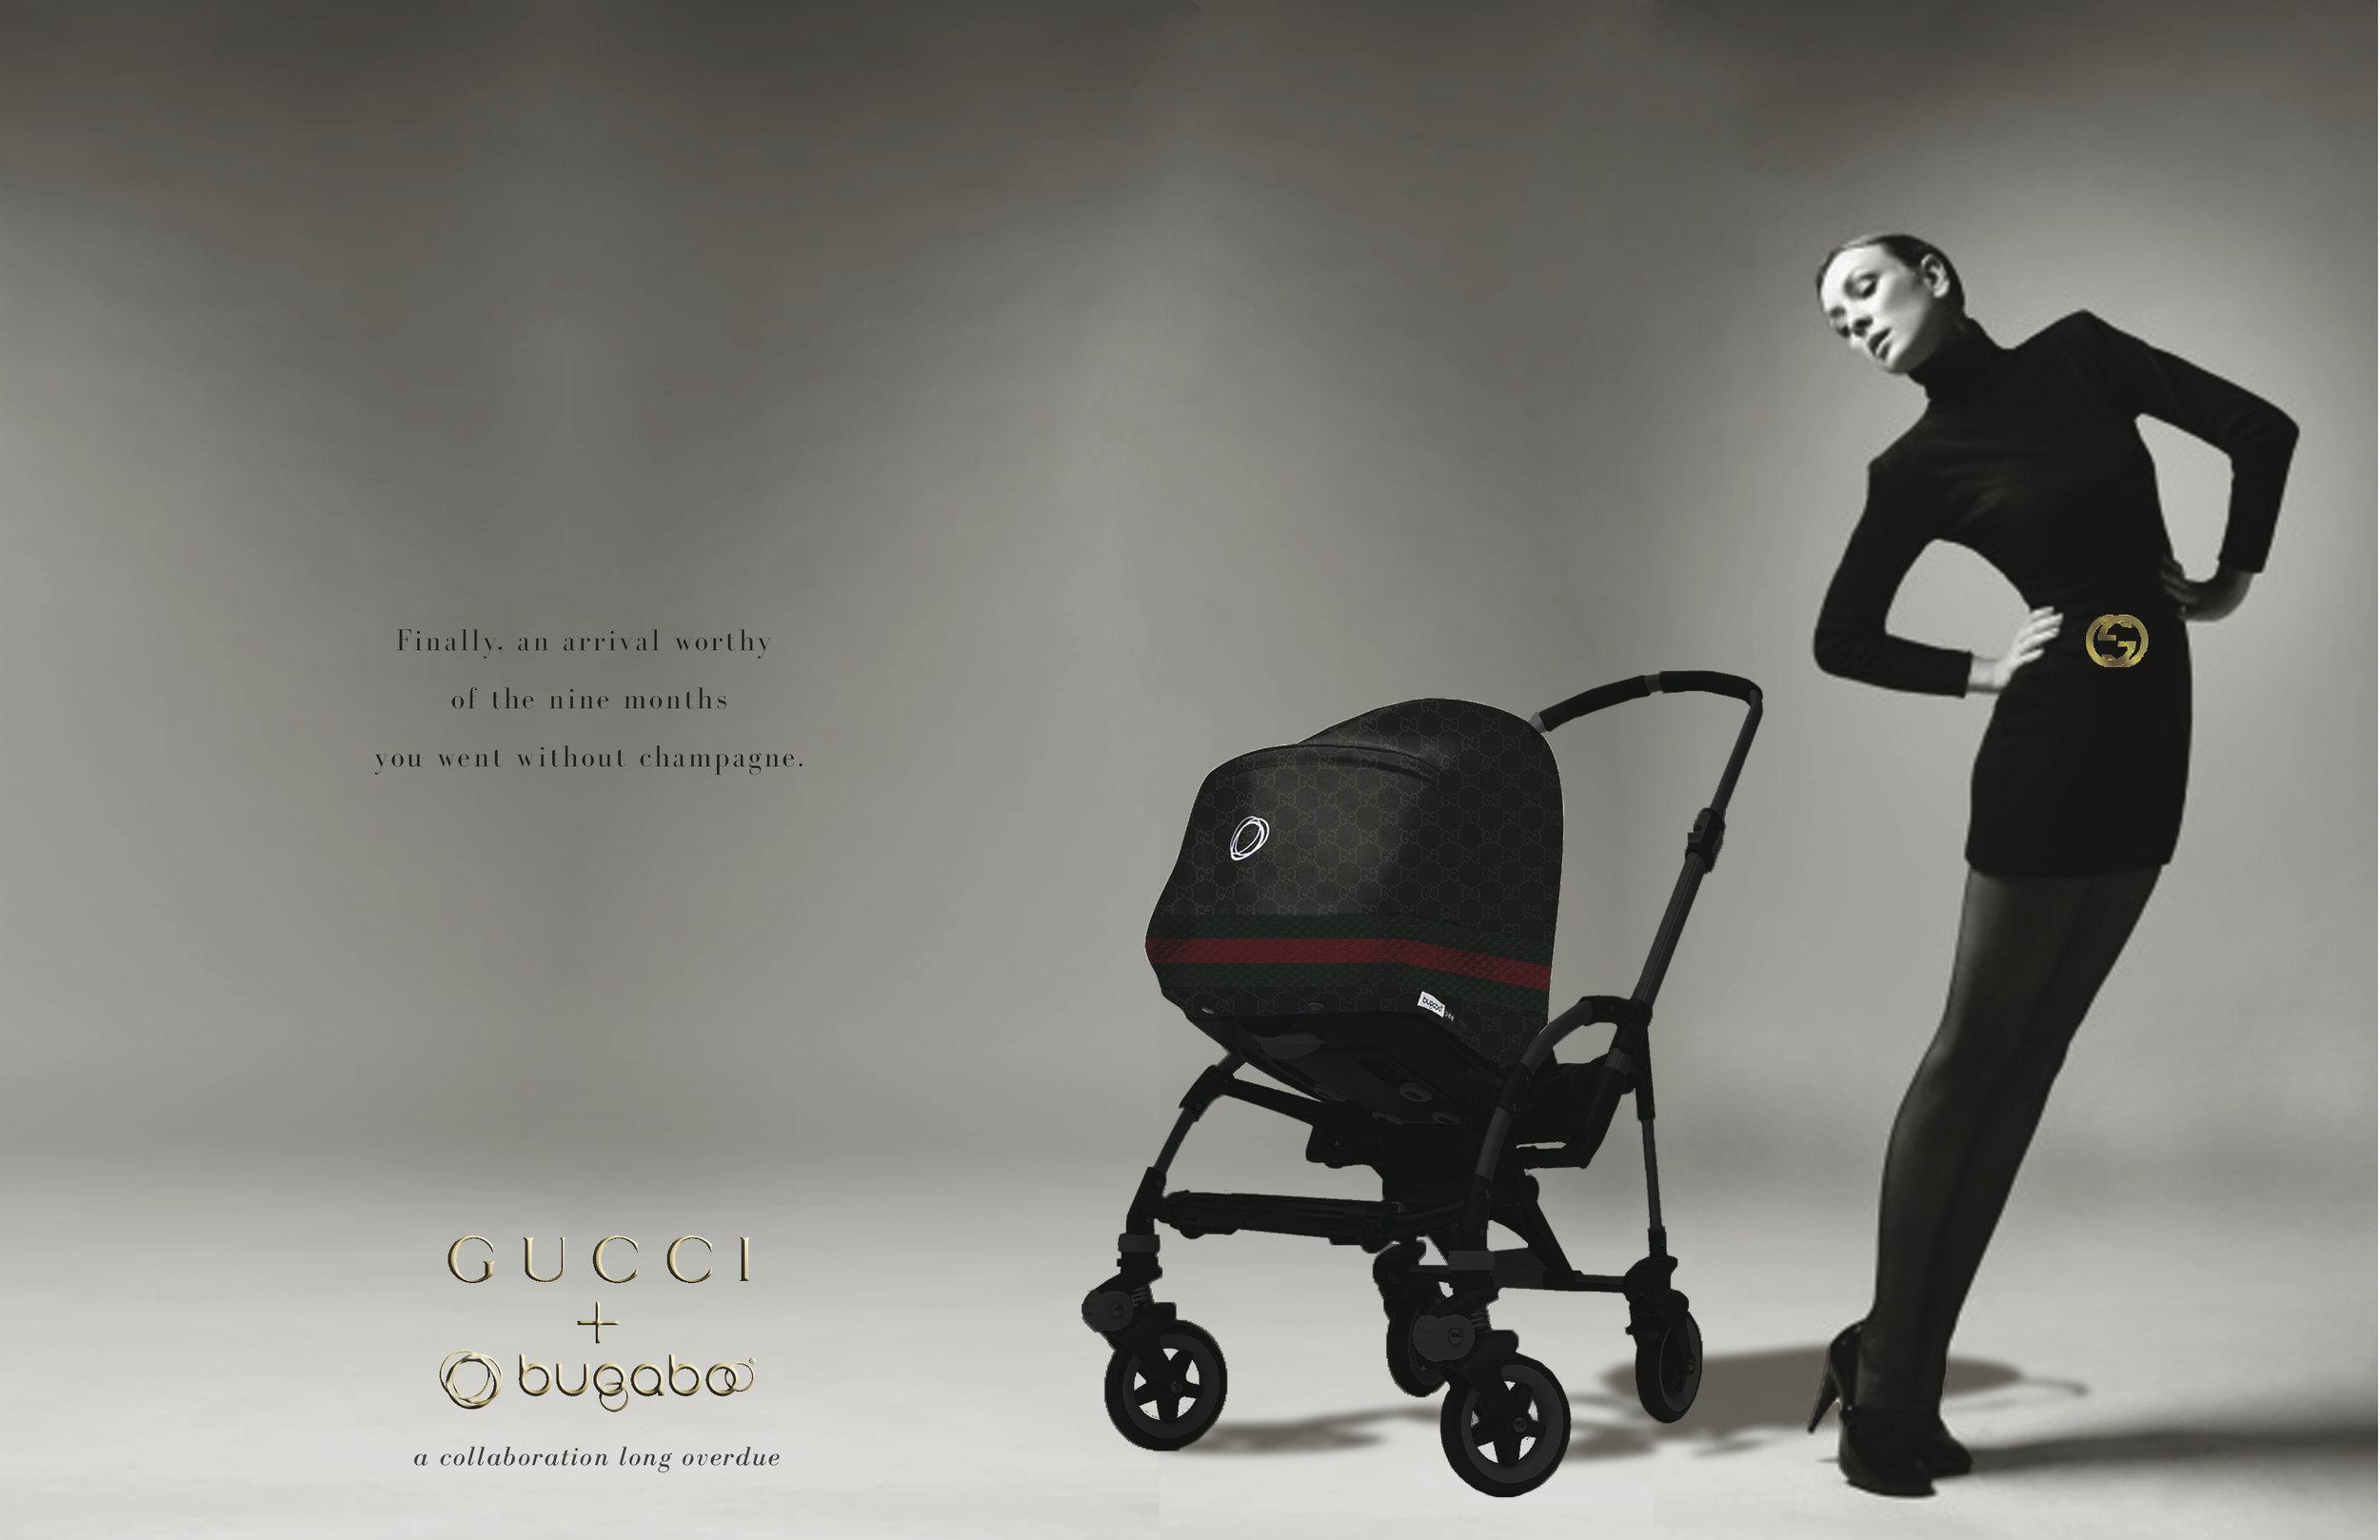 Gucci Bugaboo.jpg